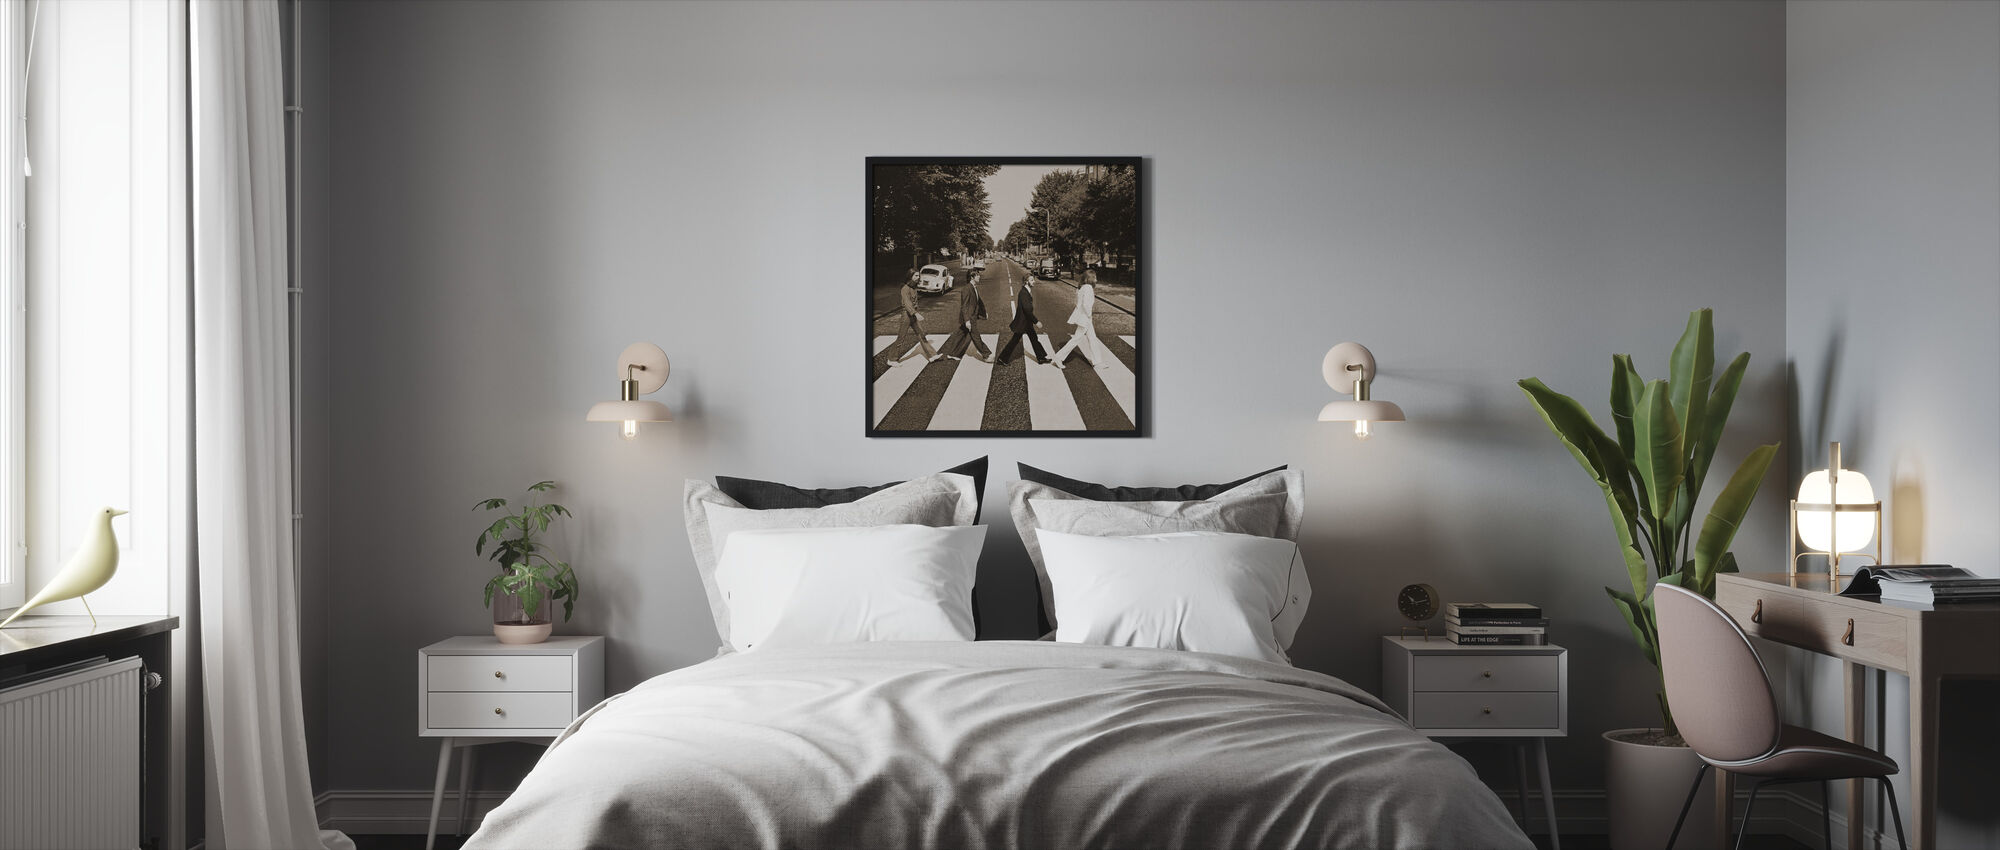 Beatles - Abbey Road Sepia - Innrammet bilde - Soverom